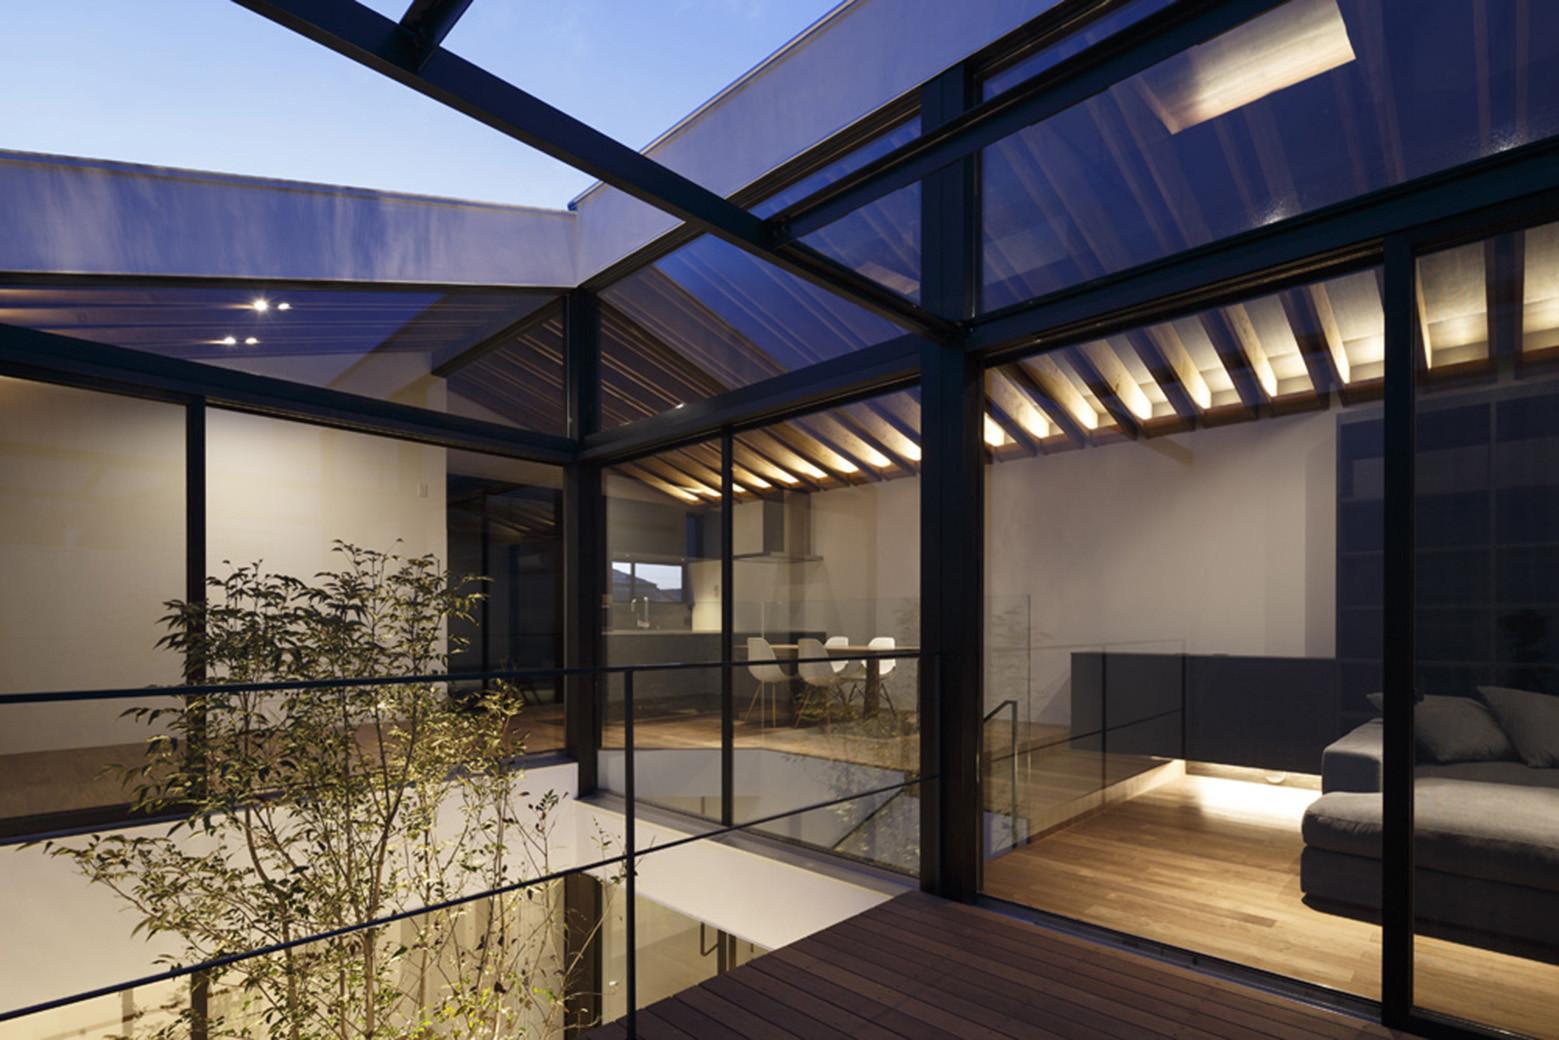 gallery of patio house apollo architects amp associates 6